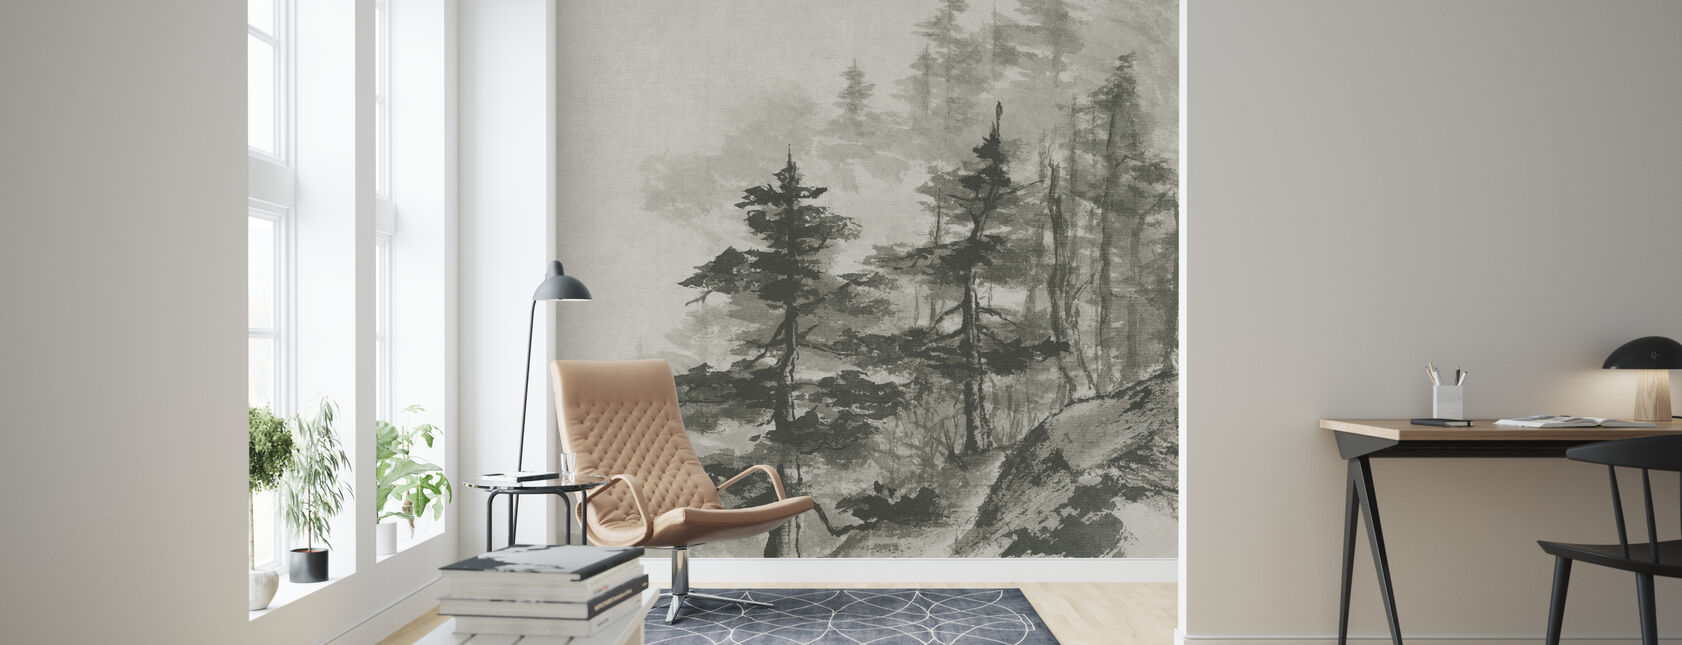 Sumi Treetops - Papier peint - Salle à manger